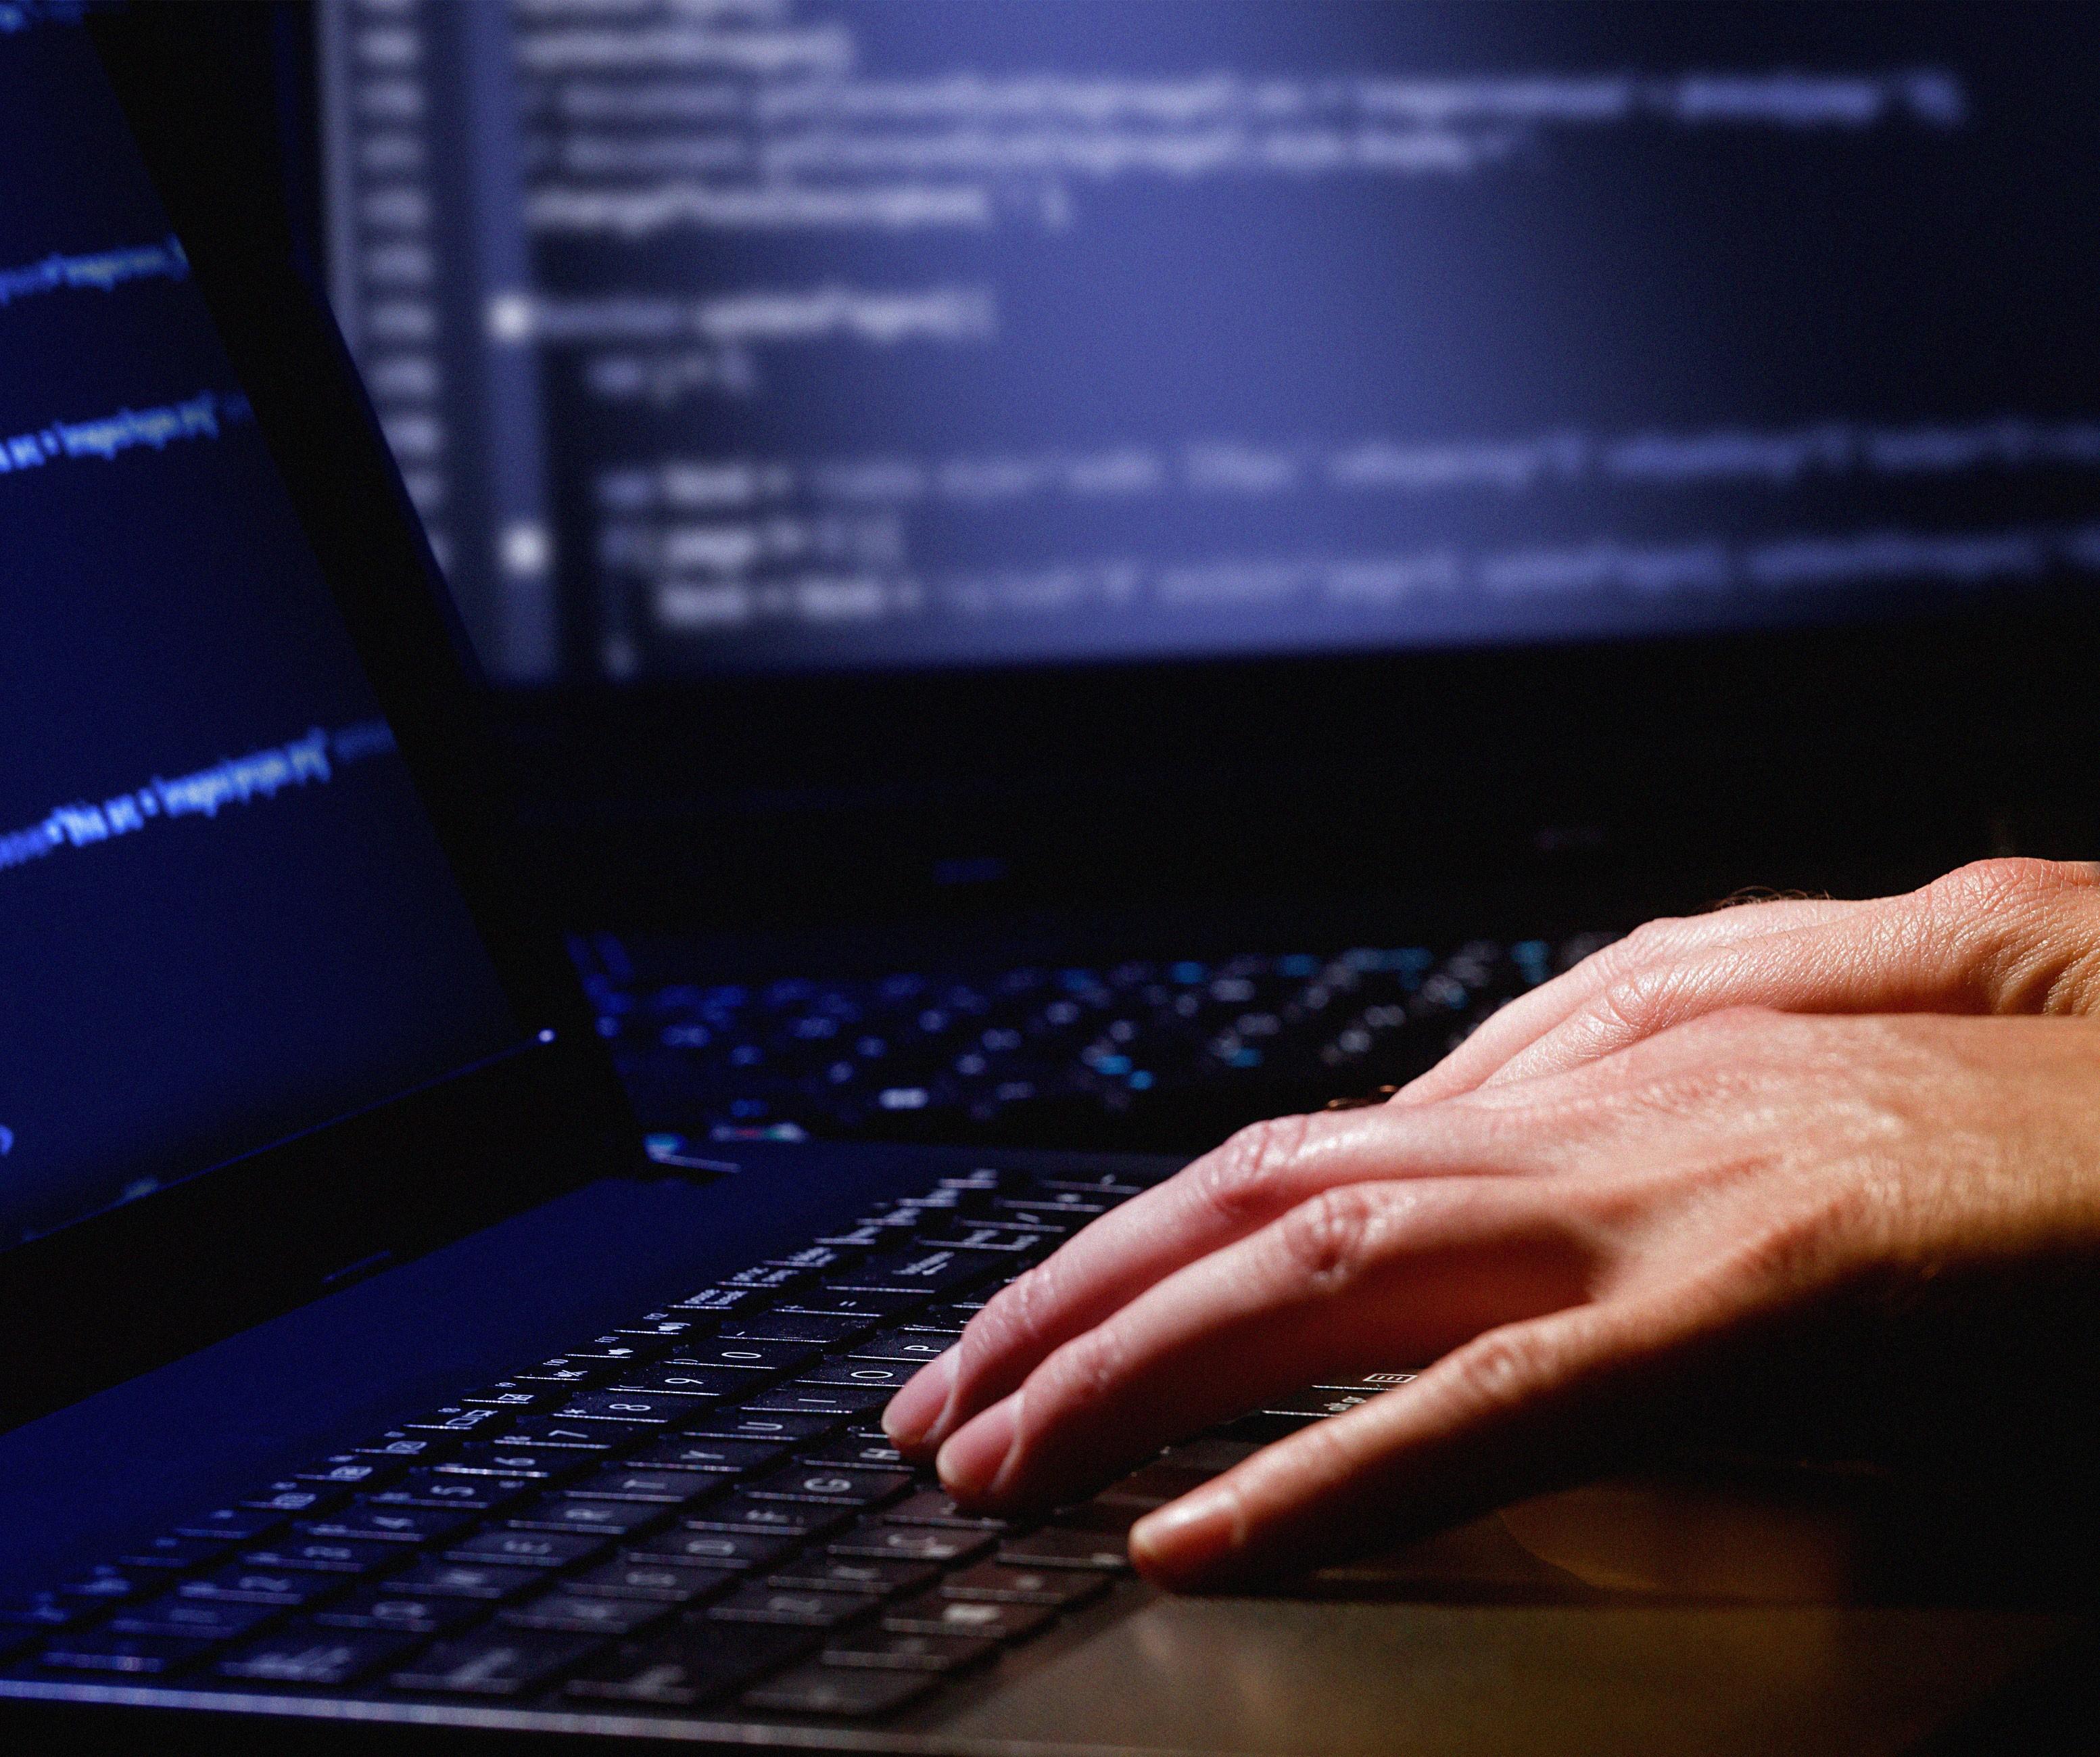 Картинки по запросу хакері присілают письма